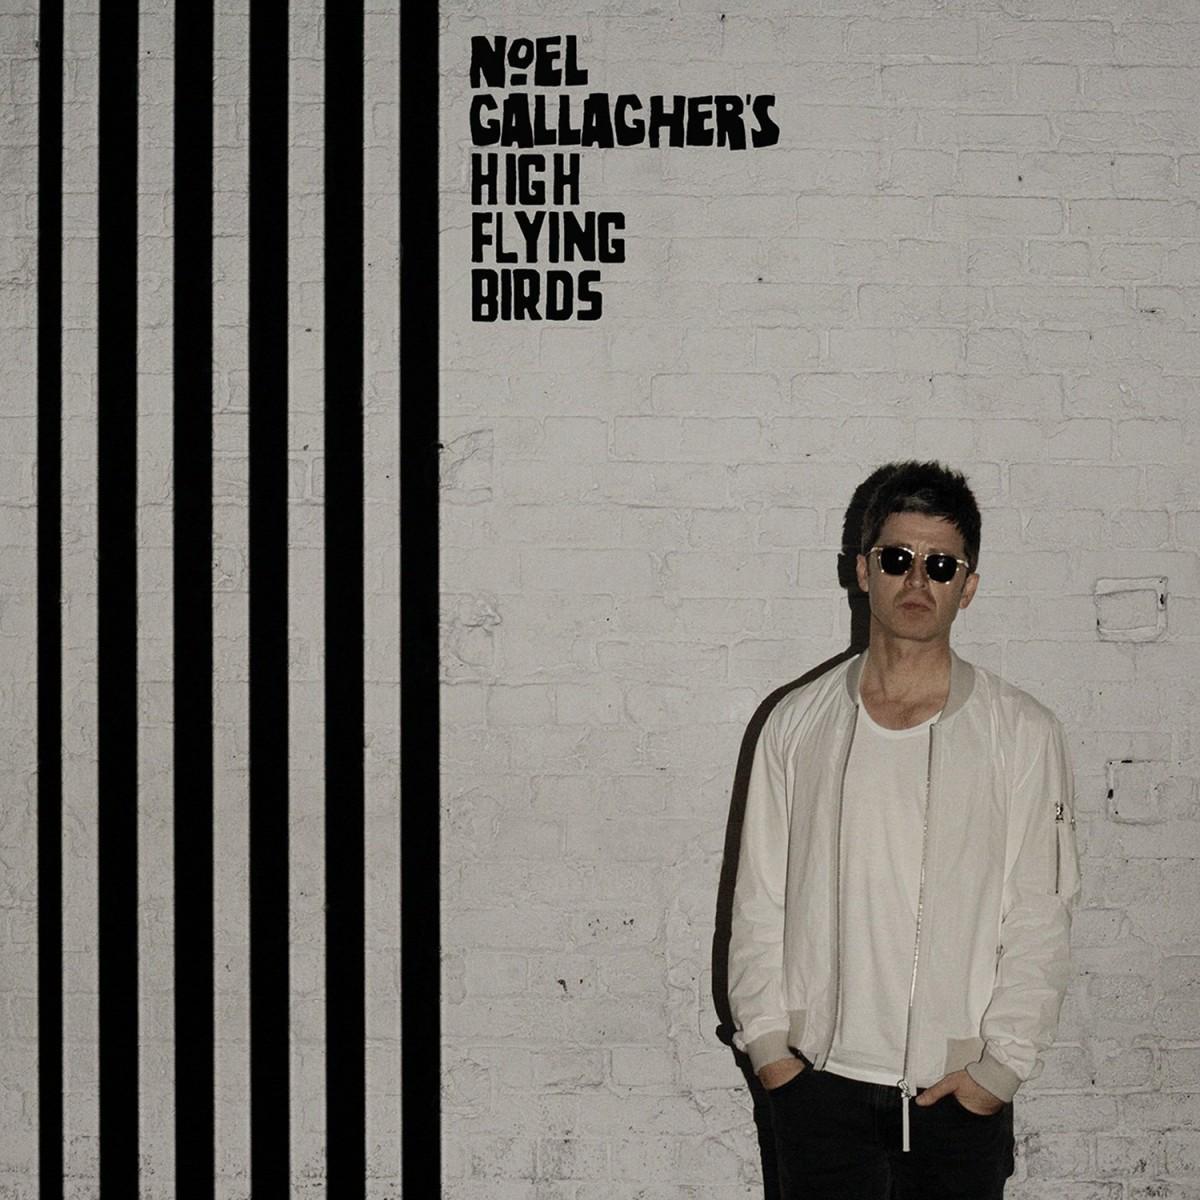 Noel Gallagher's High Flying Birds: Chasing Yesterday (2015)